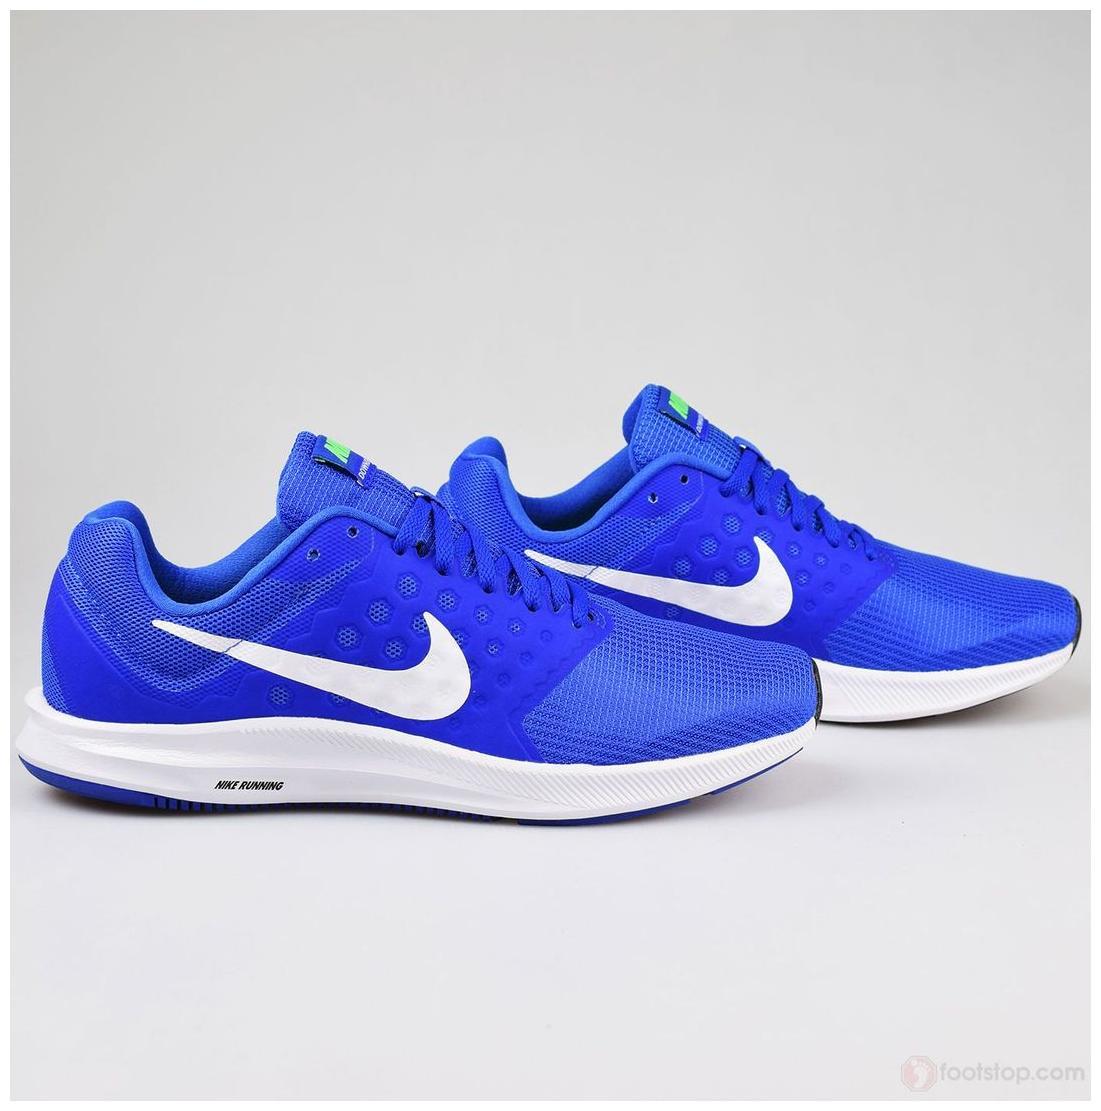 d8c8b0dc8c5bb Nike Men Blue Running Shoes - 852459-402 for Men - Buy Nike Men s Sport  Shoes at 25% off.